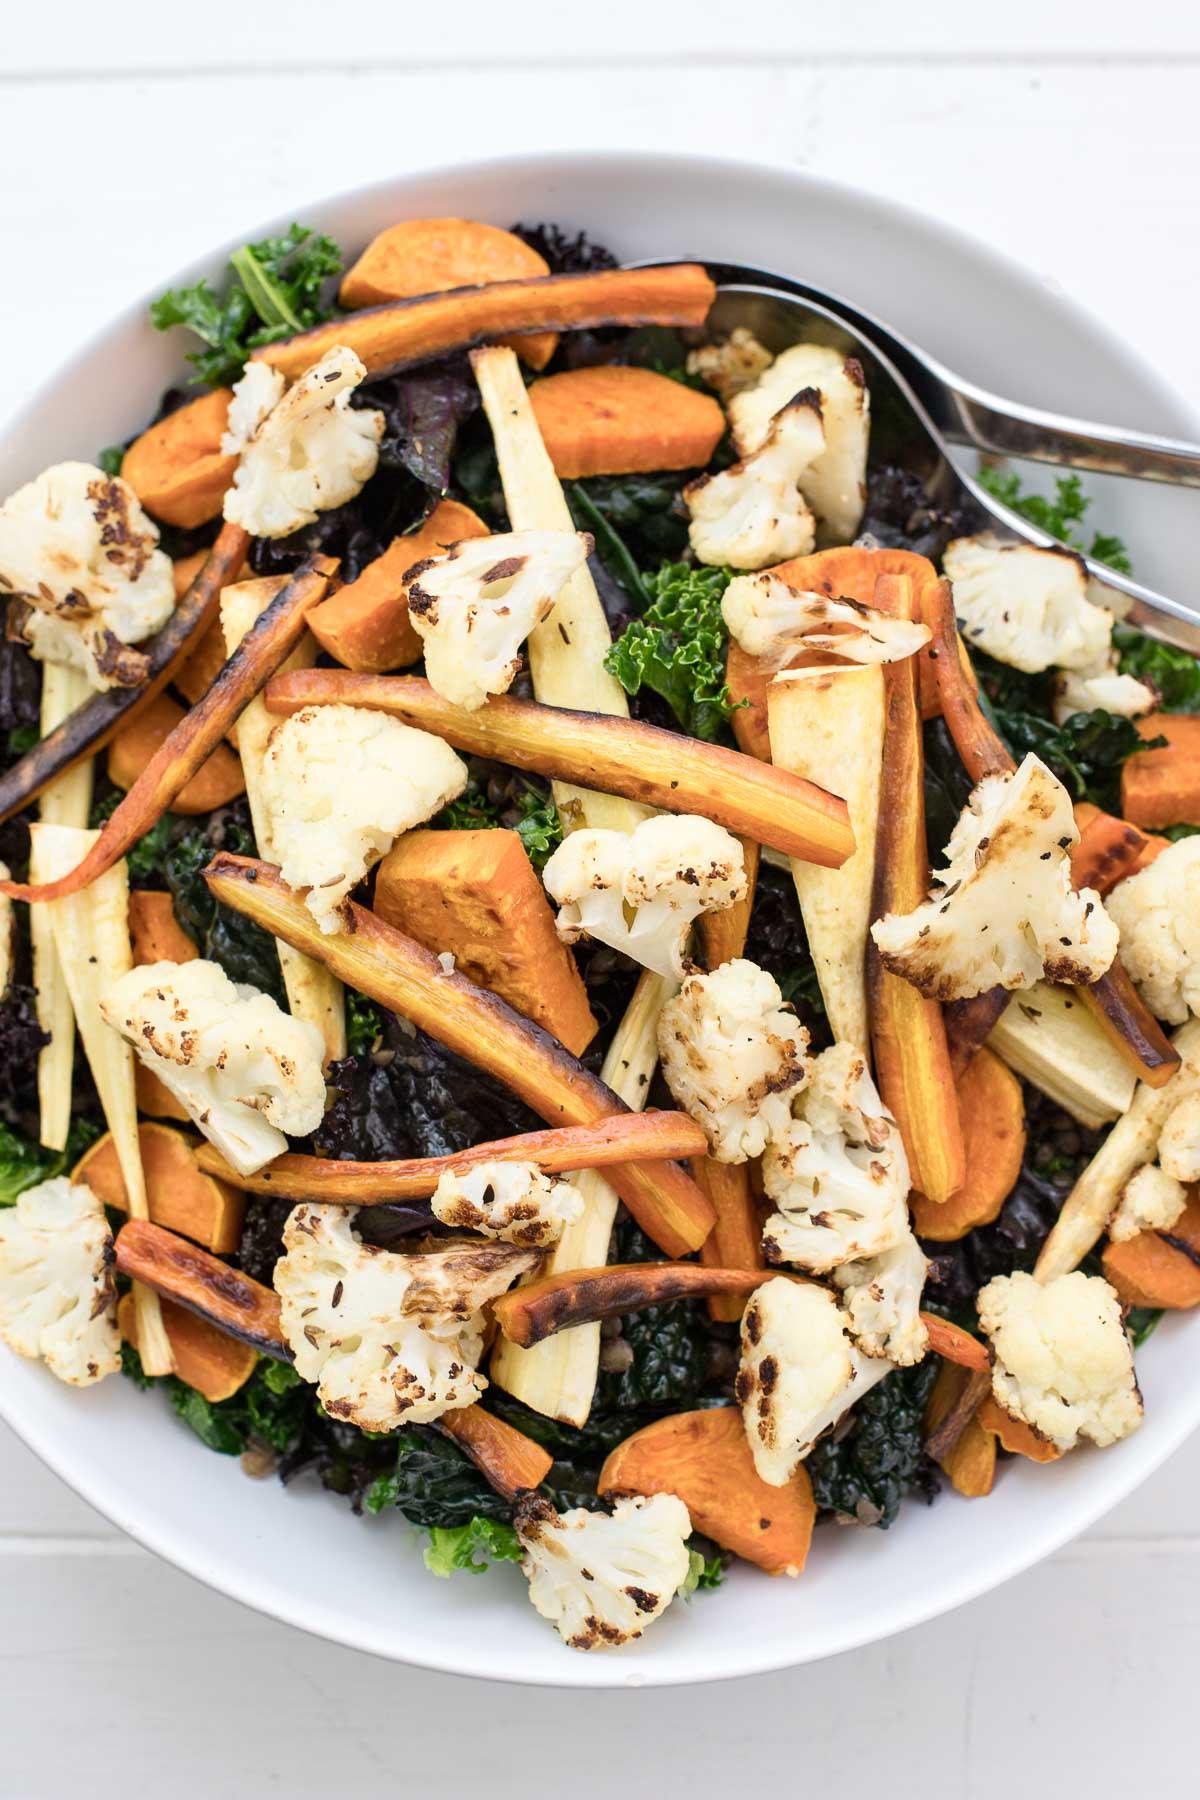 Grünkohl-Salat mit geröstetem Karotten, Pastinaken, Blumenkohl, Süßkartoffeln, Linsen und Tahin-Dressing